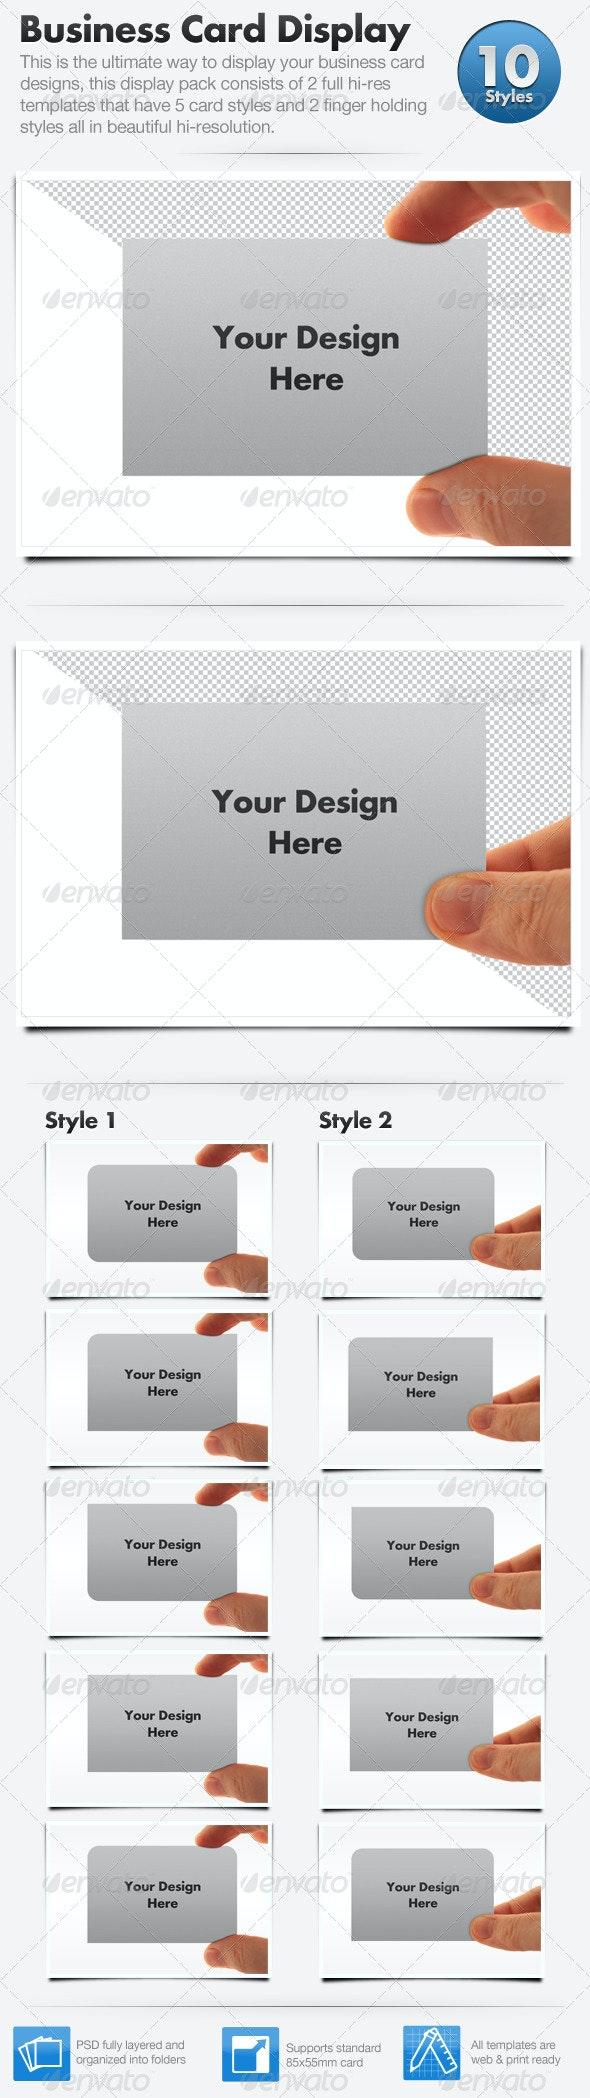 Business Card Display Templates - Hi Res - Business Cards Print